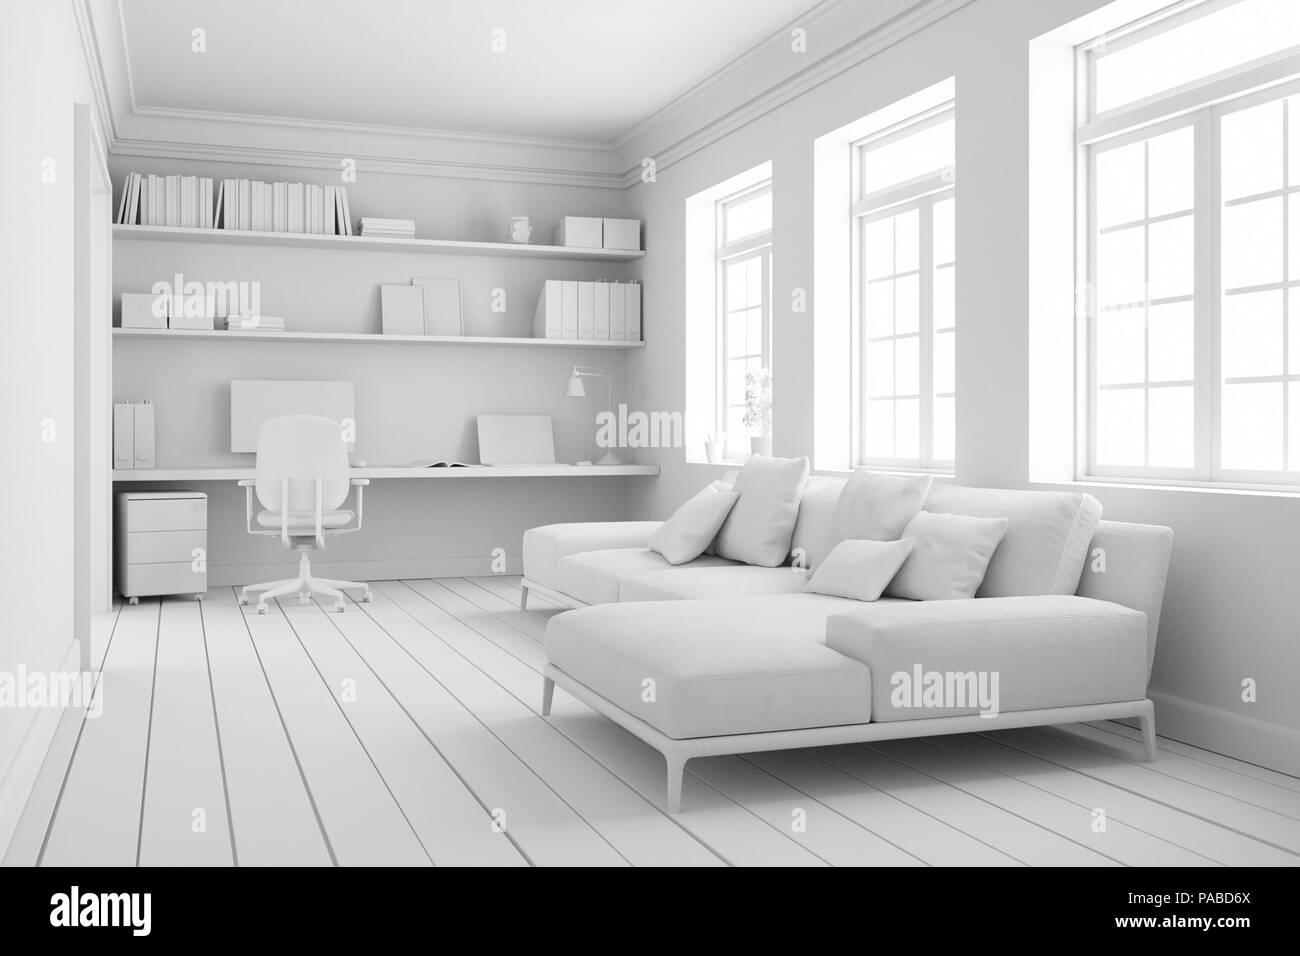 Modelo De Oficina De Casa Habitación Diseño De Interiores 3d